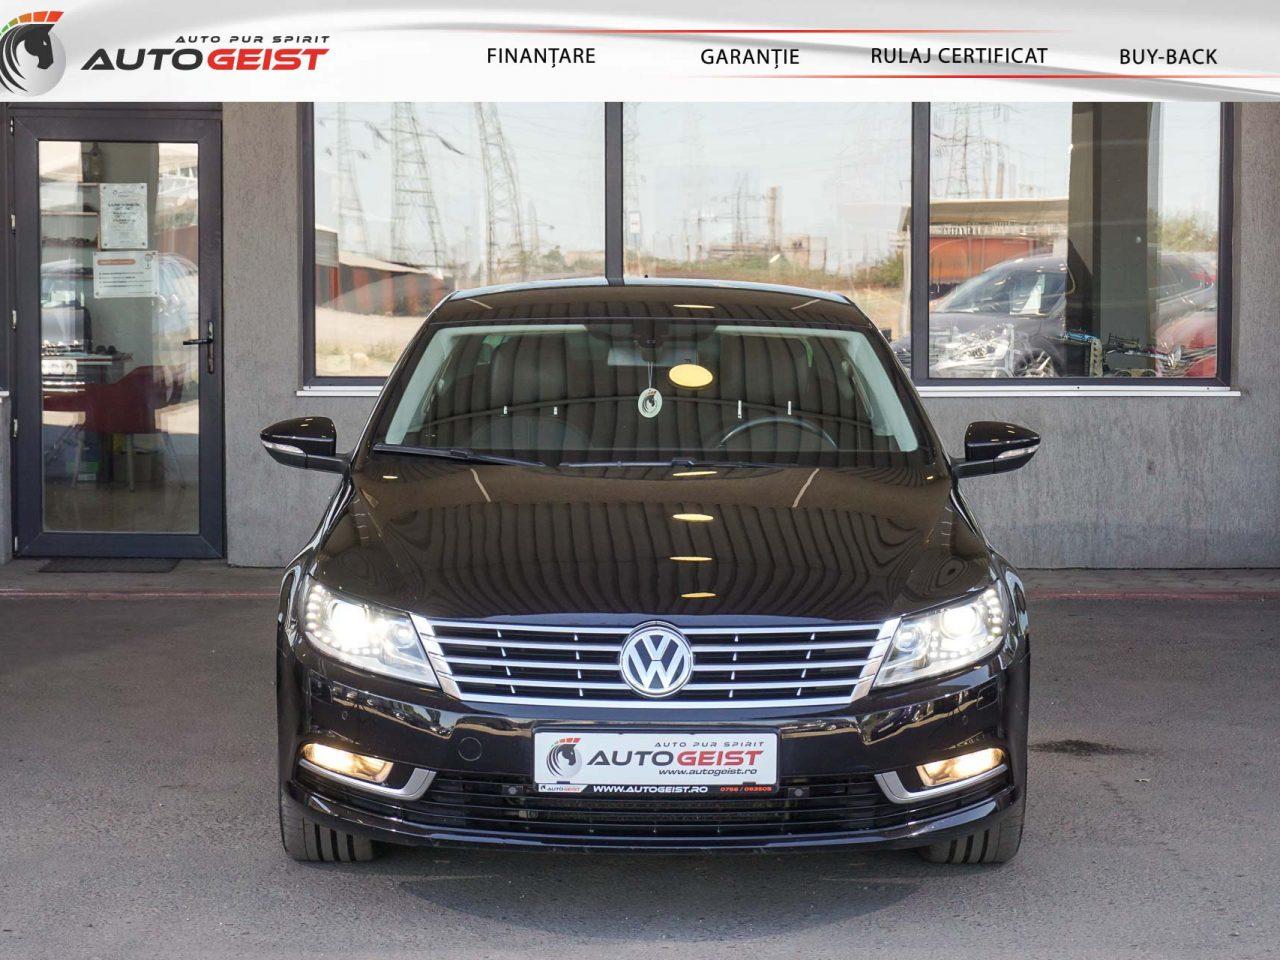 volkswagen-cc-negru-at-02969